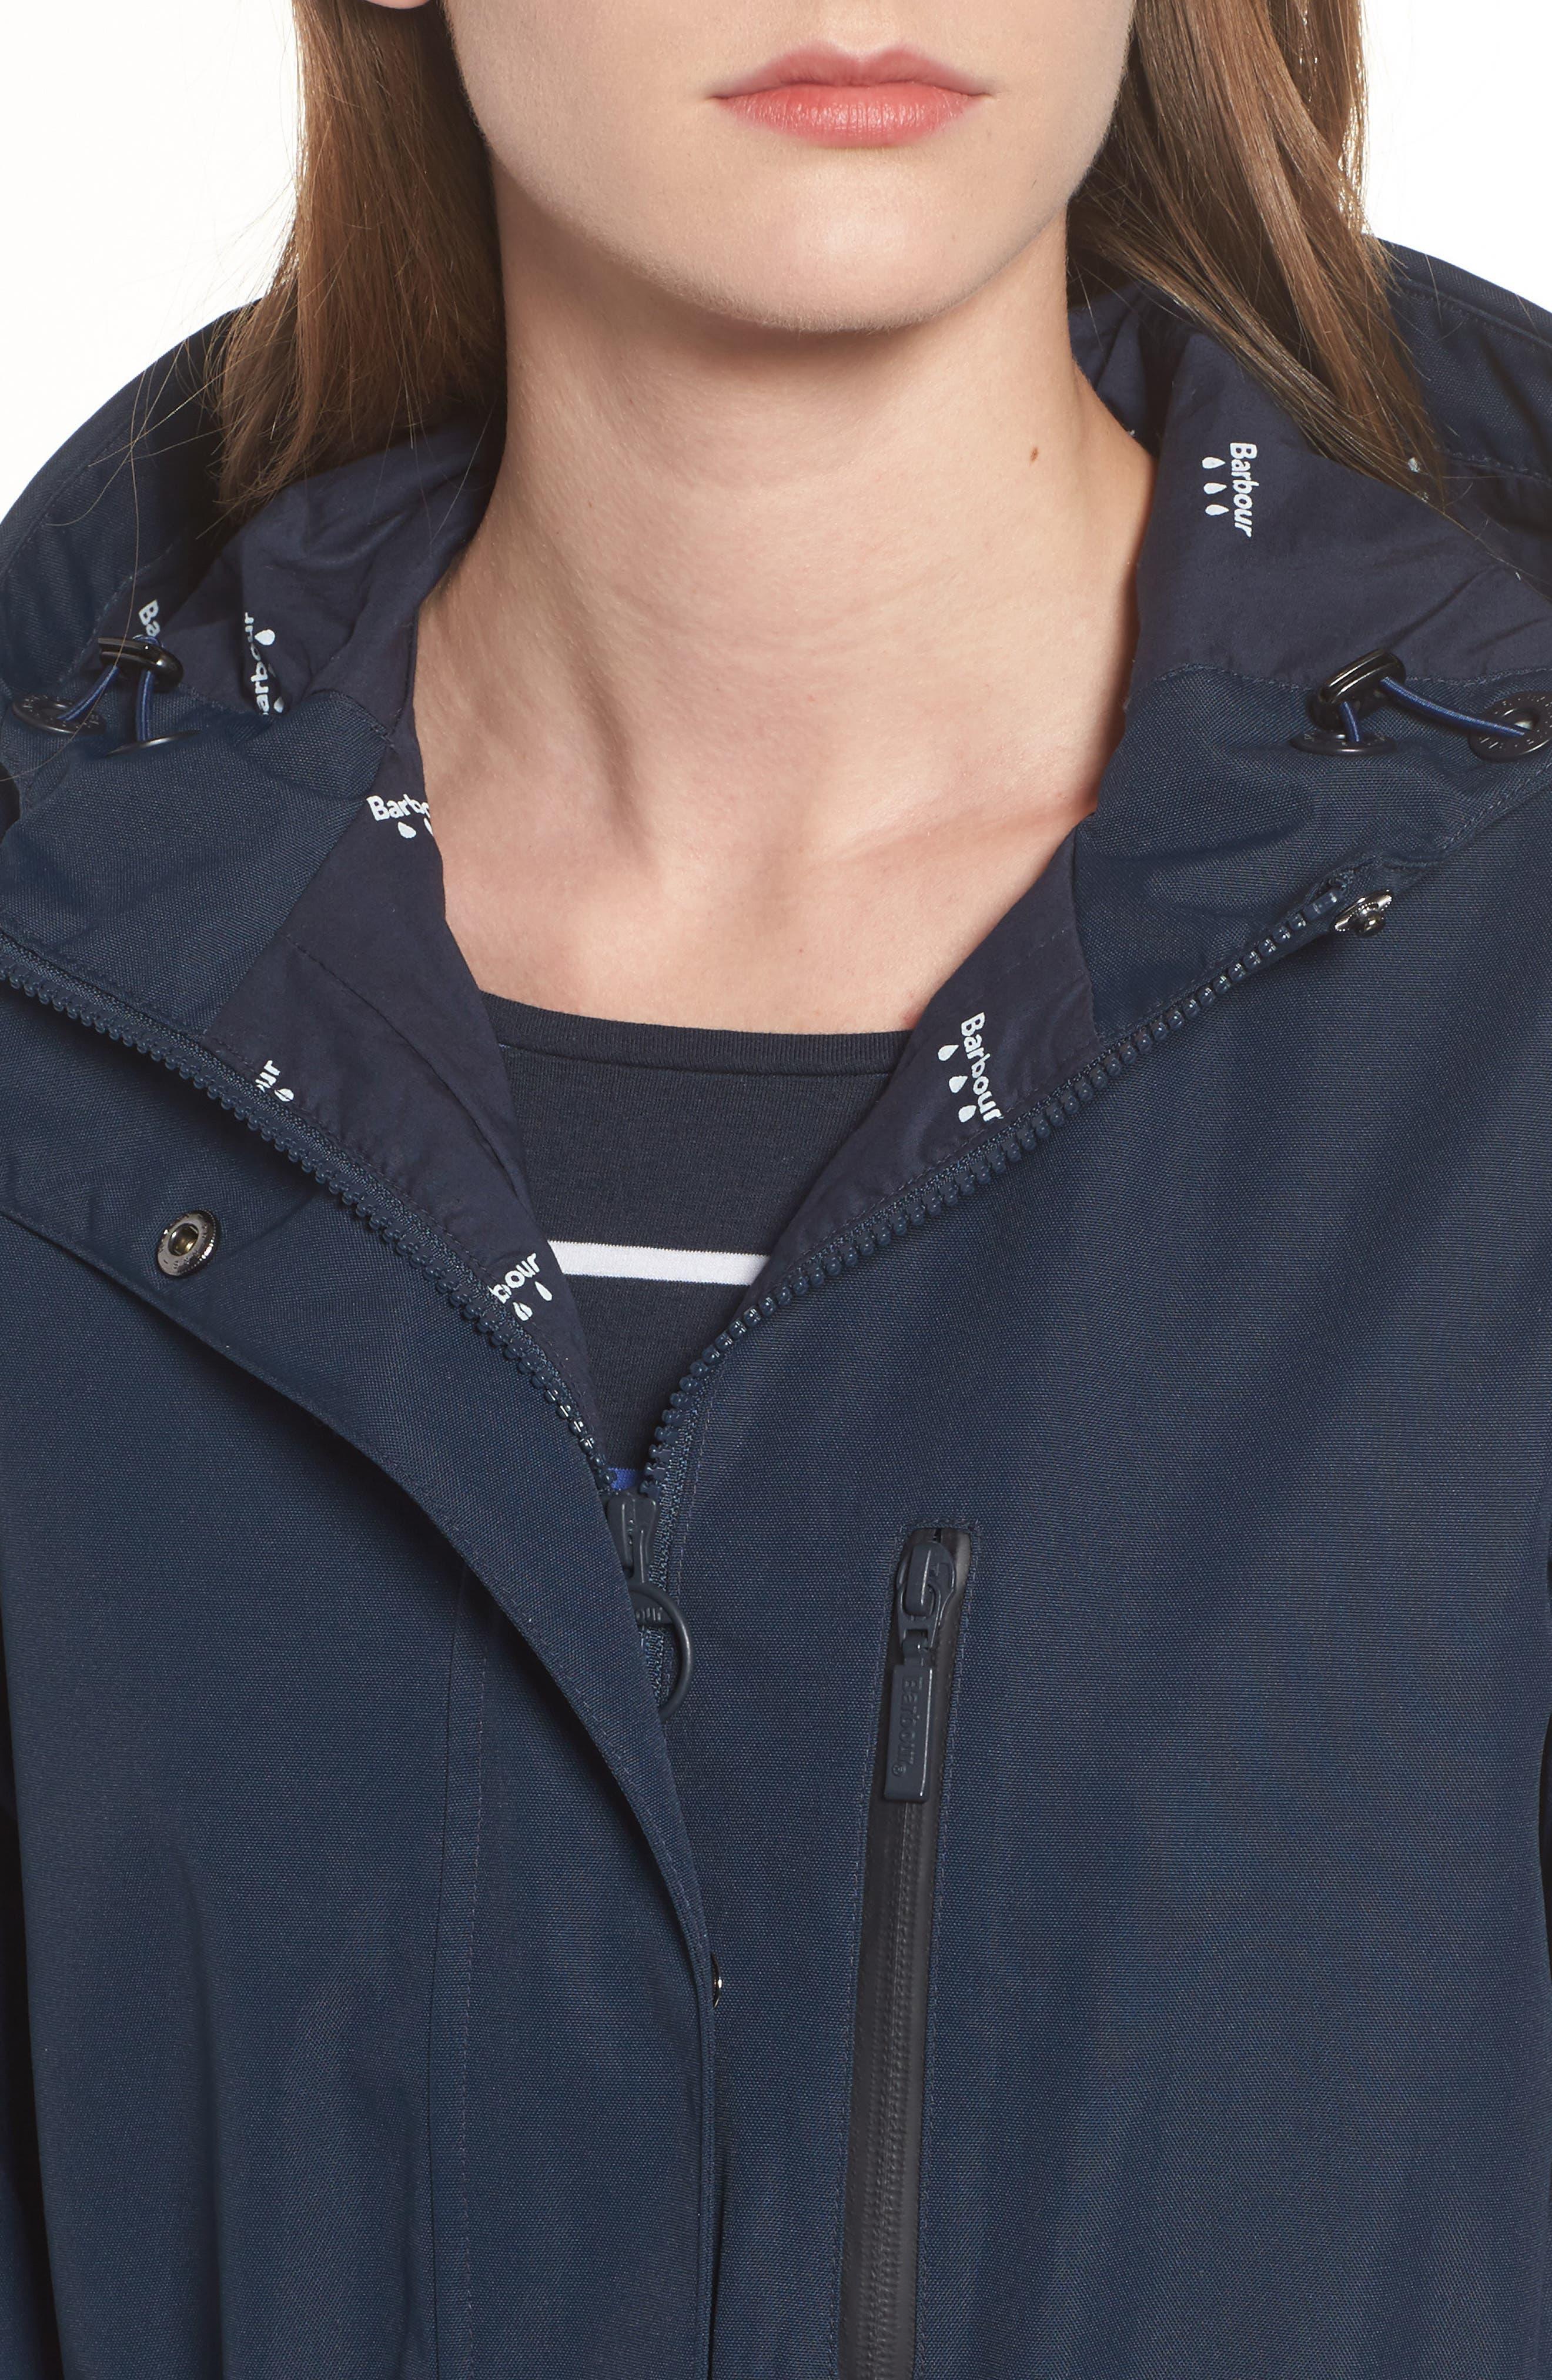 Sleet Hooded Jacket,                             Alternate thumbnail 8, color,